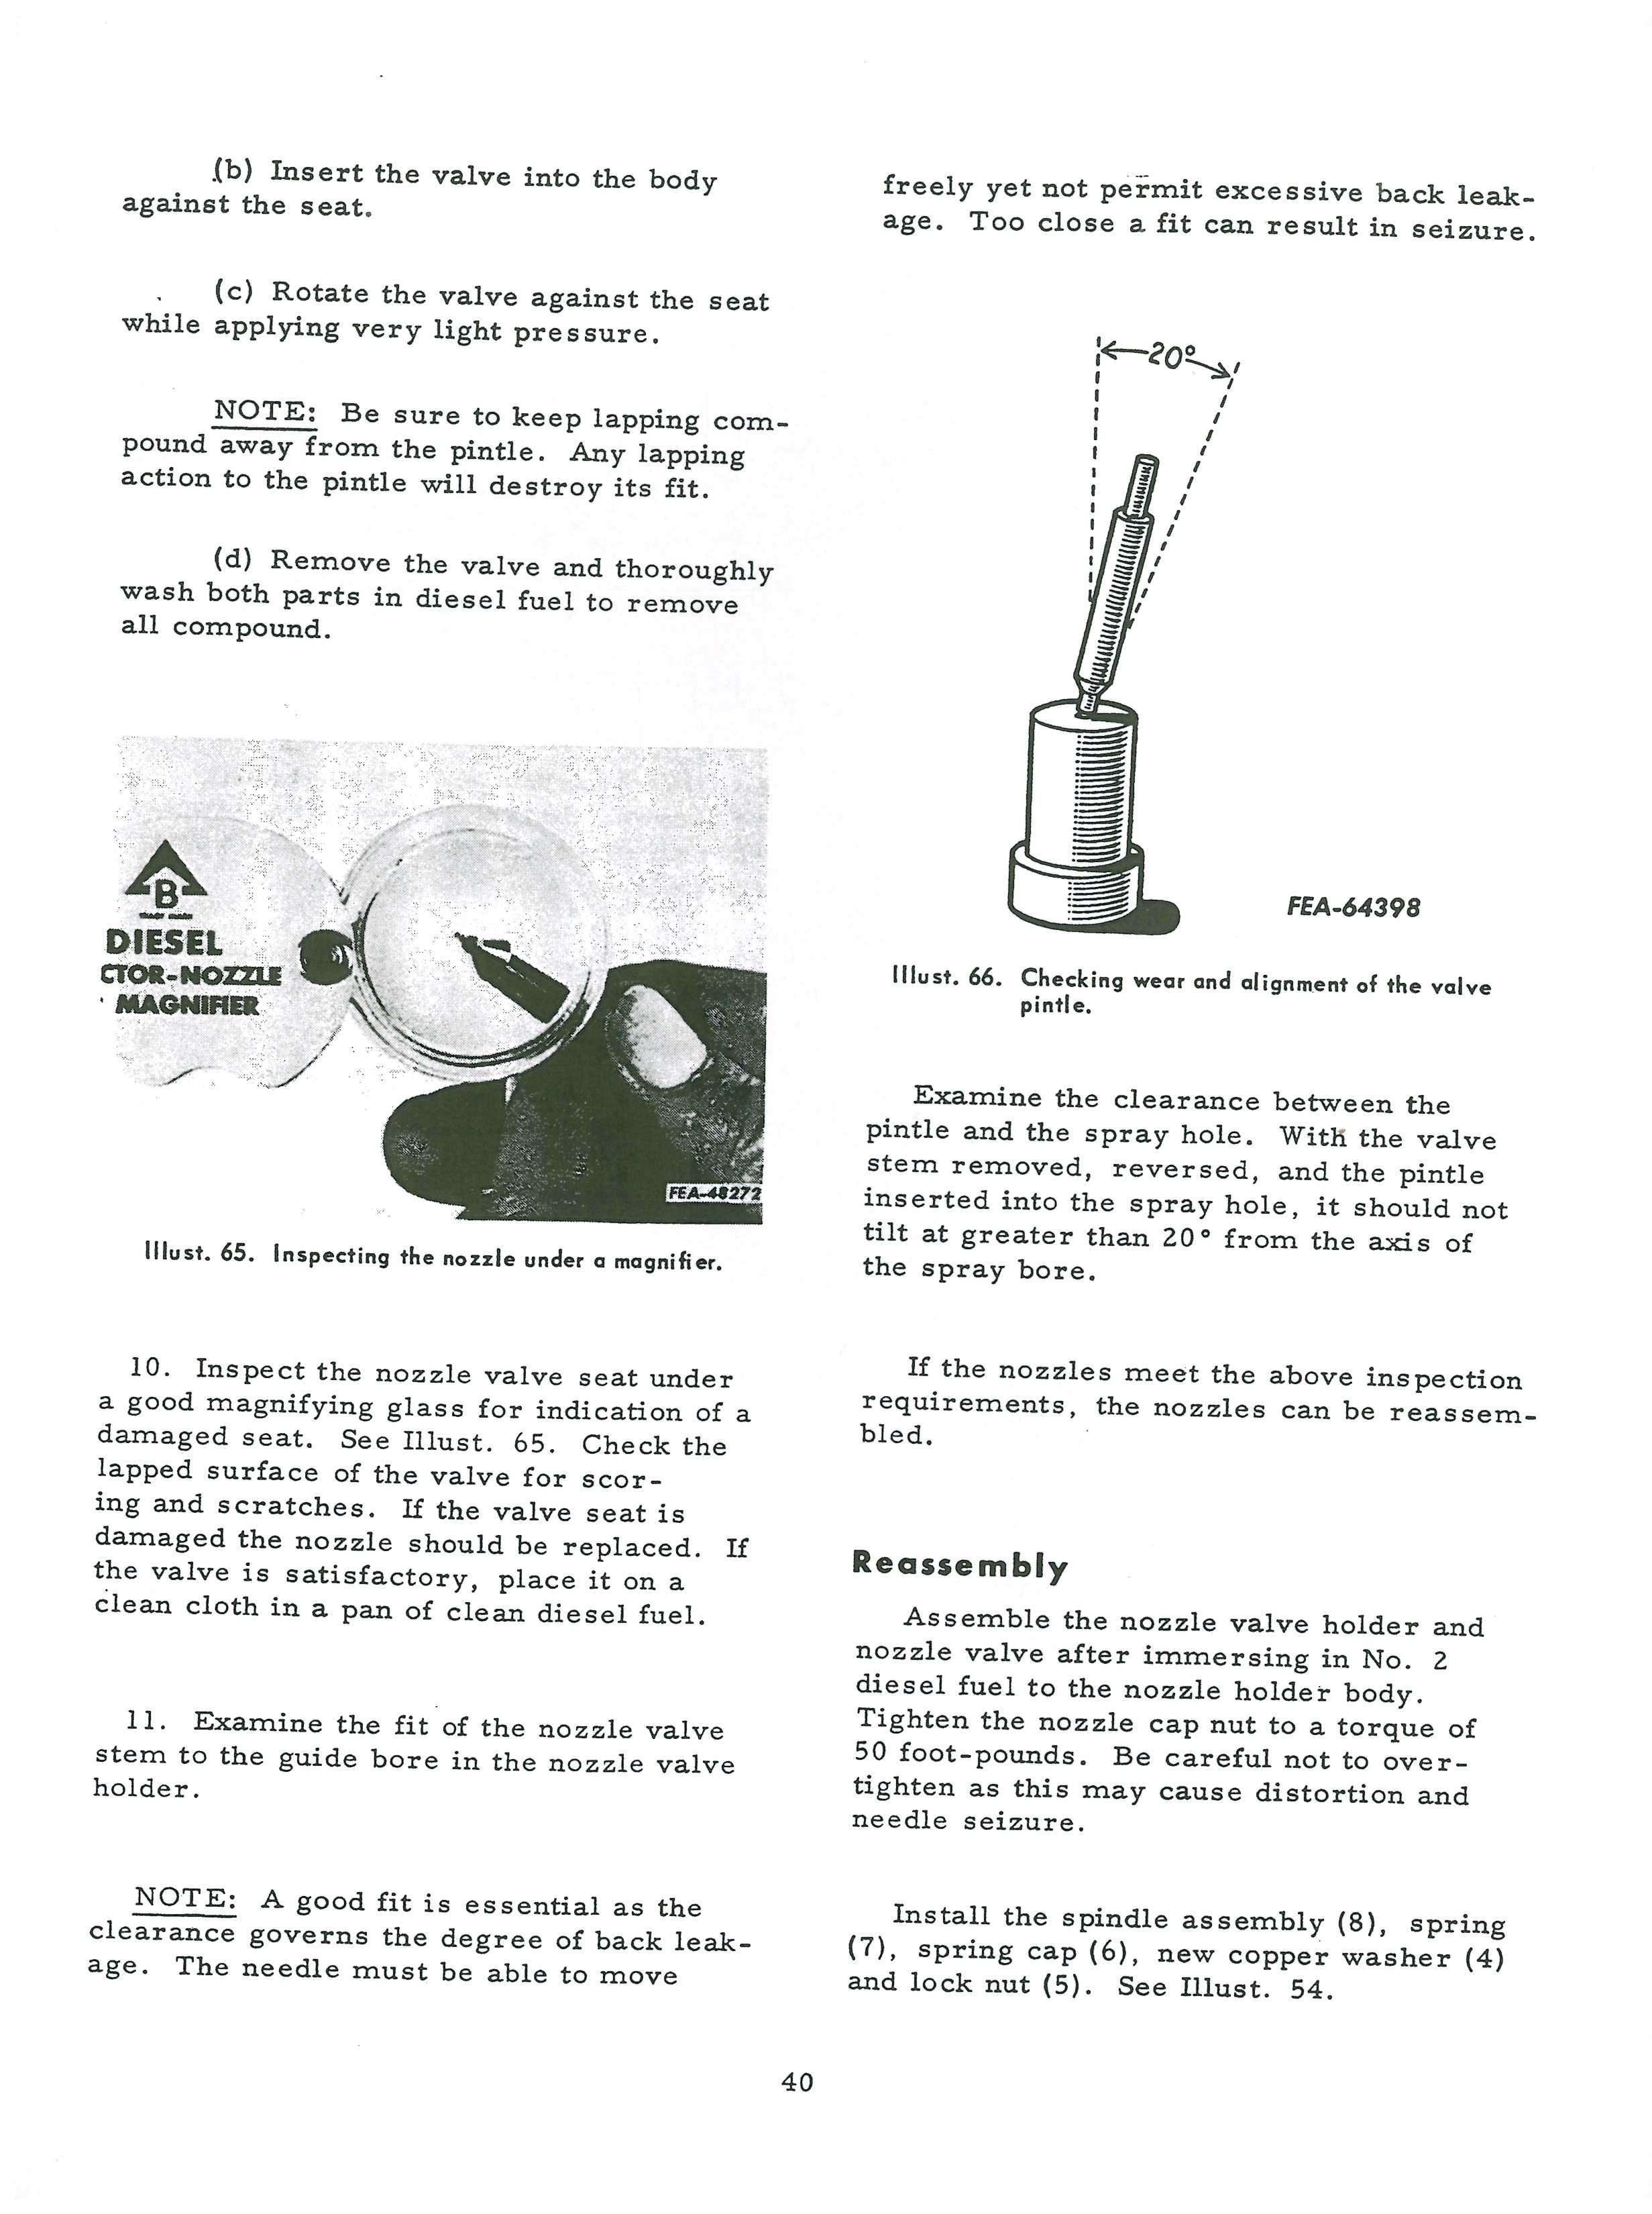 International Harvester CAV Diesel Injection Pumps Service Manual